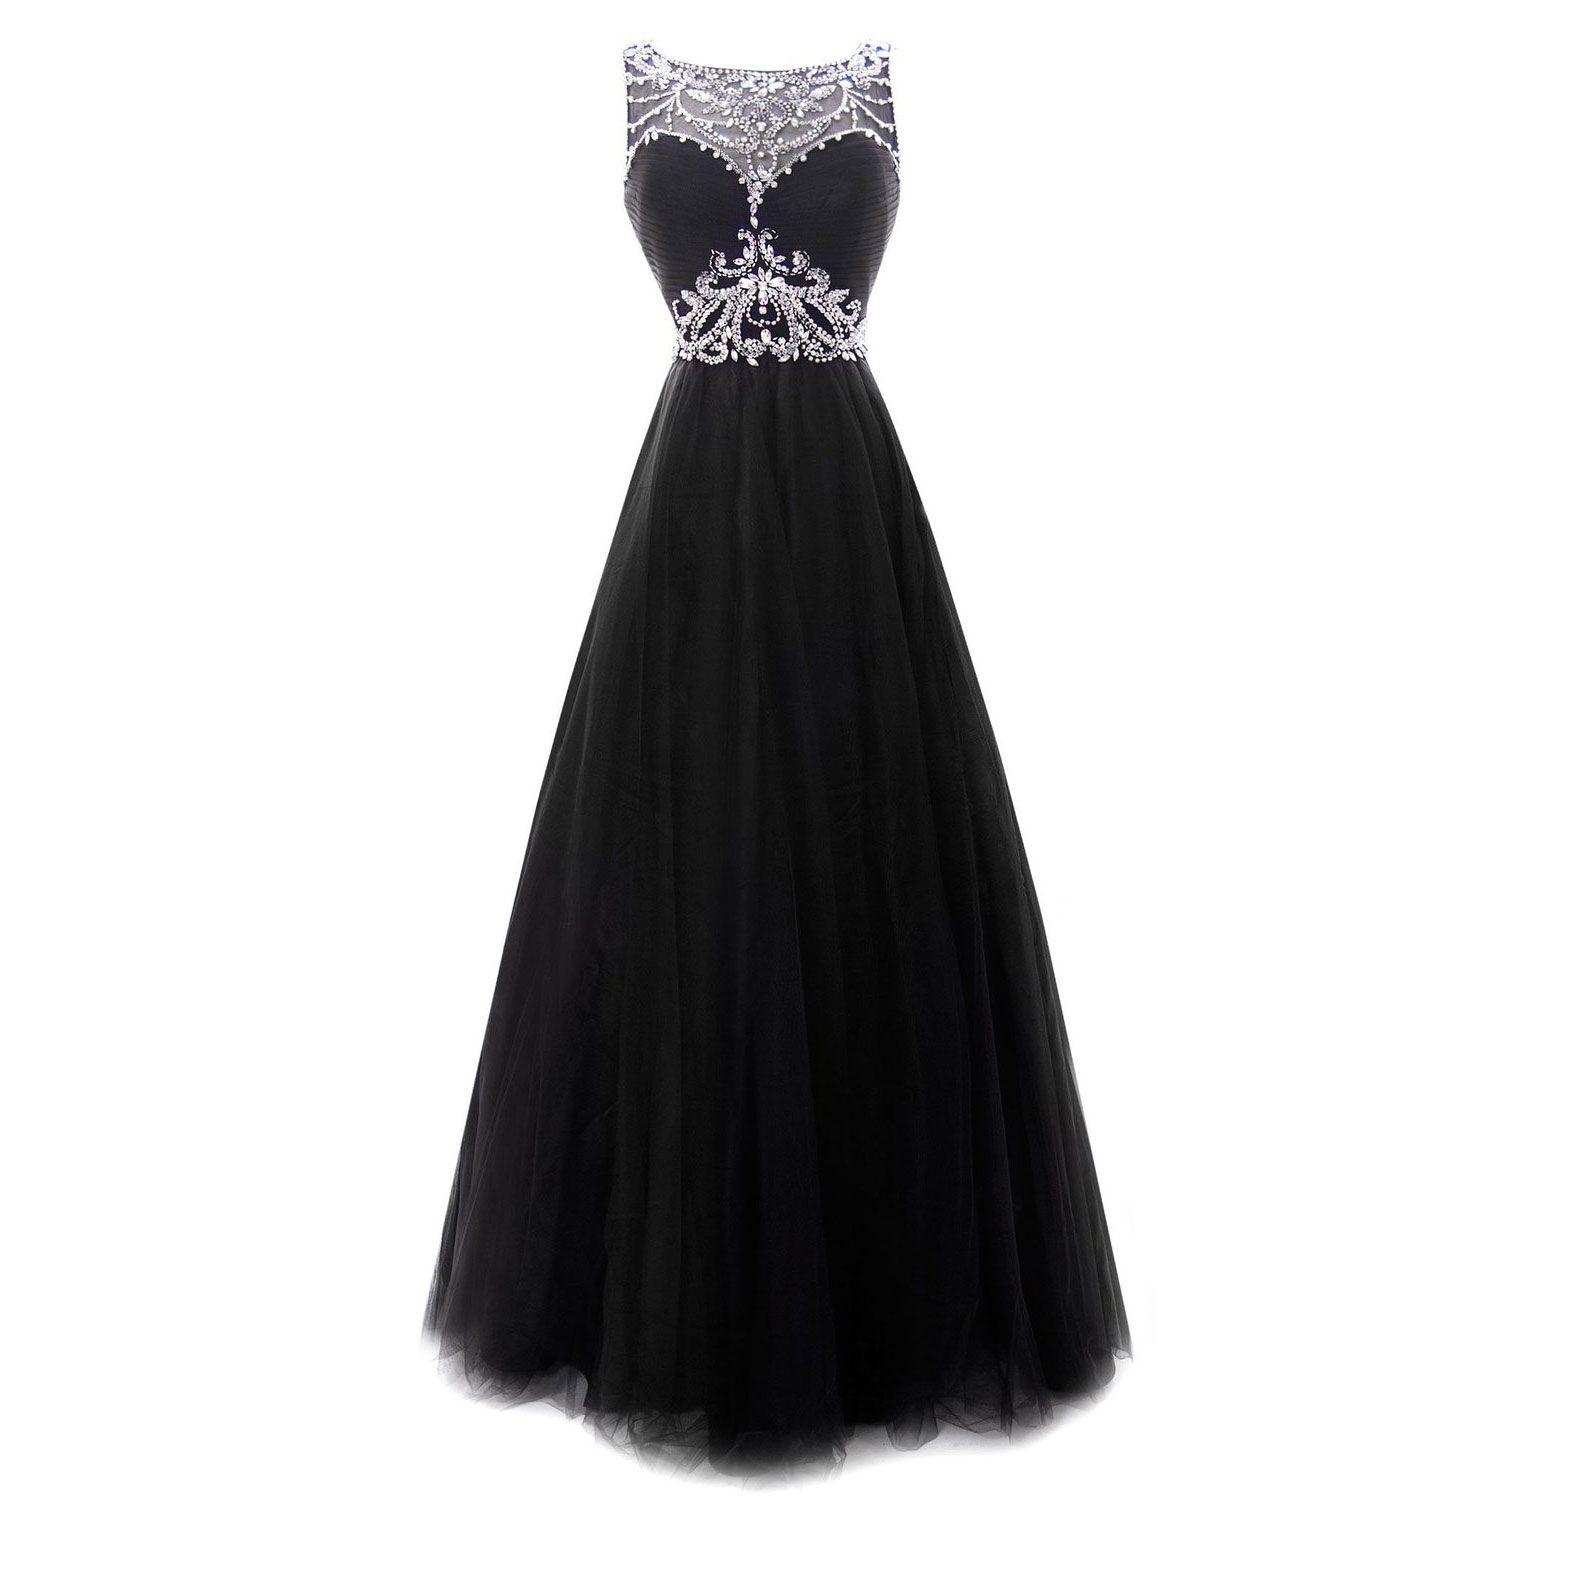 Gorgeous classy prom dressesblue prom dressescap sleeve prom